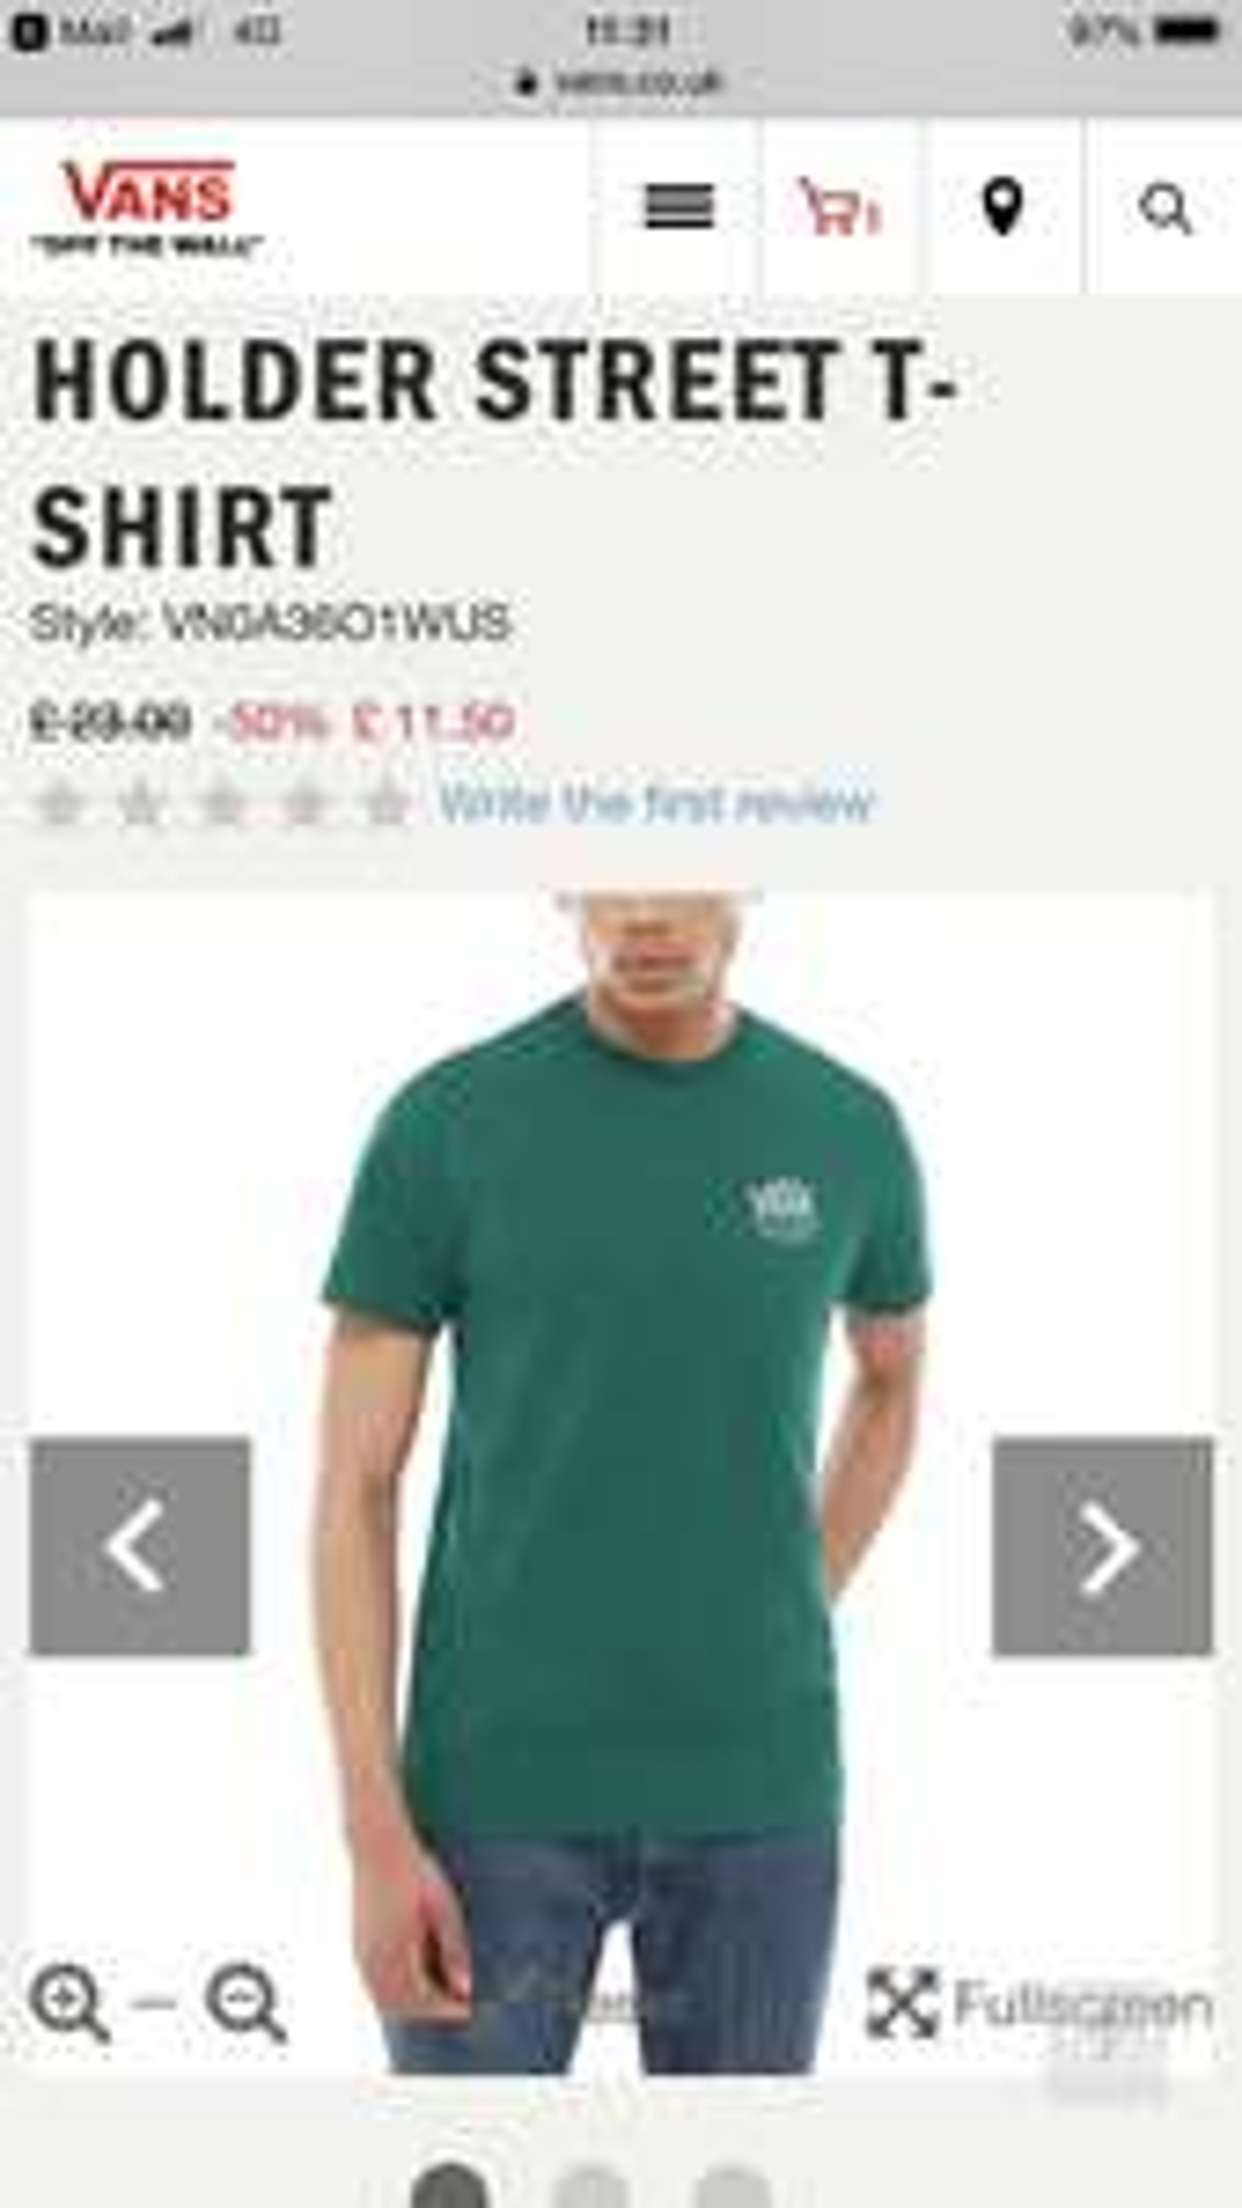 382d46b1db4fbf Vans Holder Street T-Shirt (Evergreen) £11.50 delivered   Vans (All